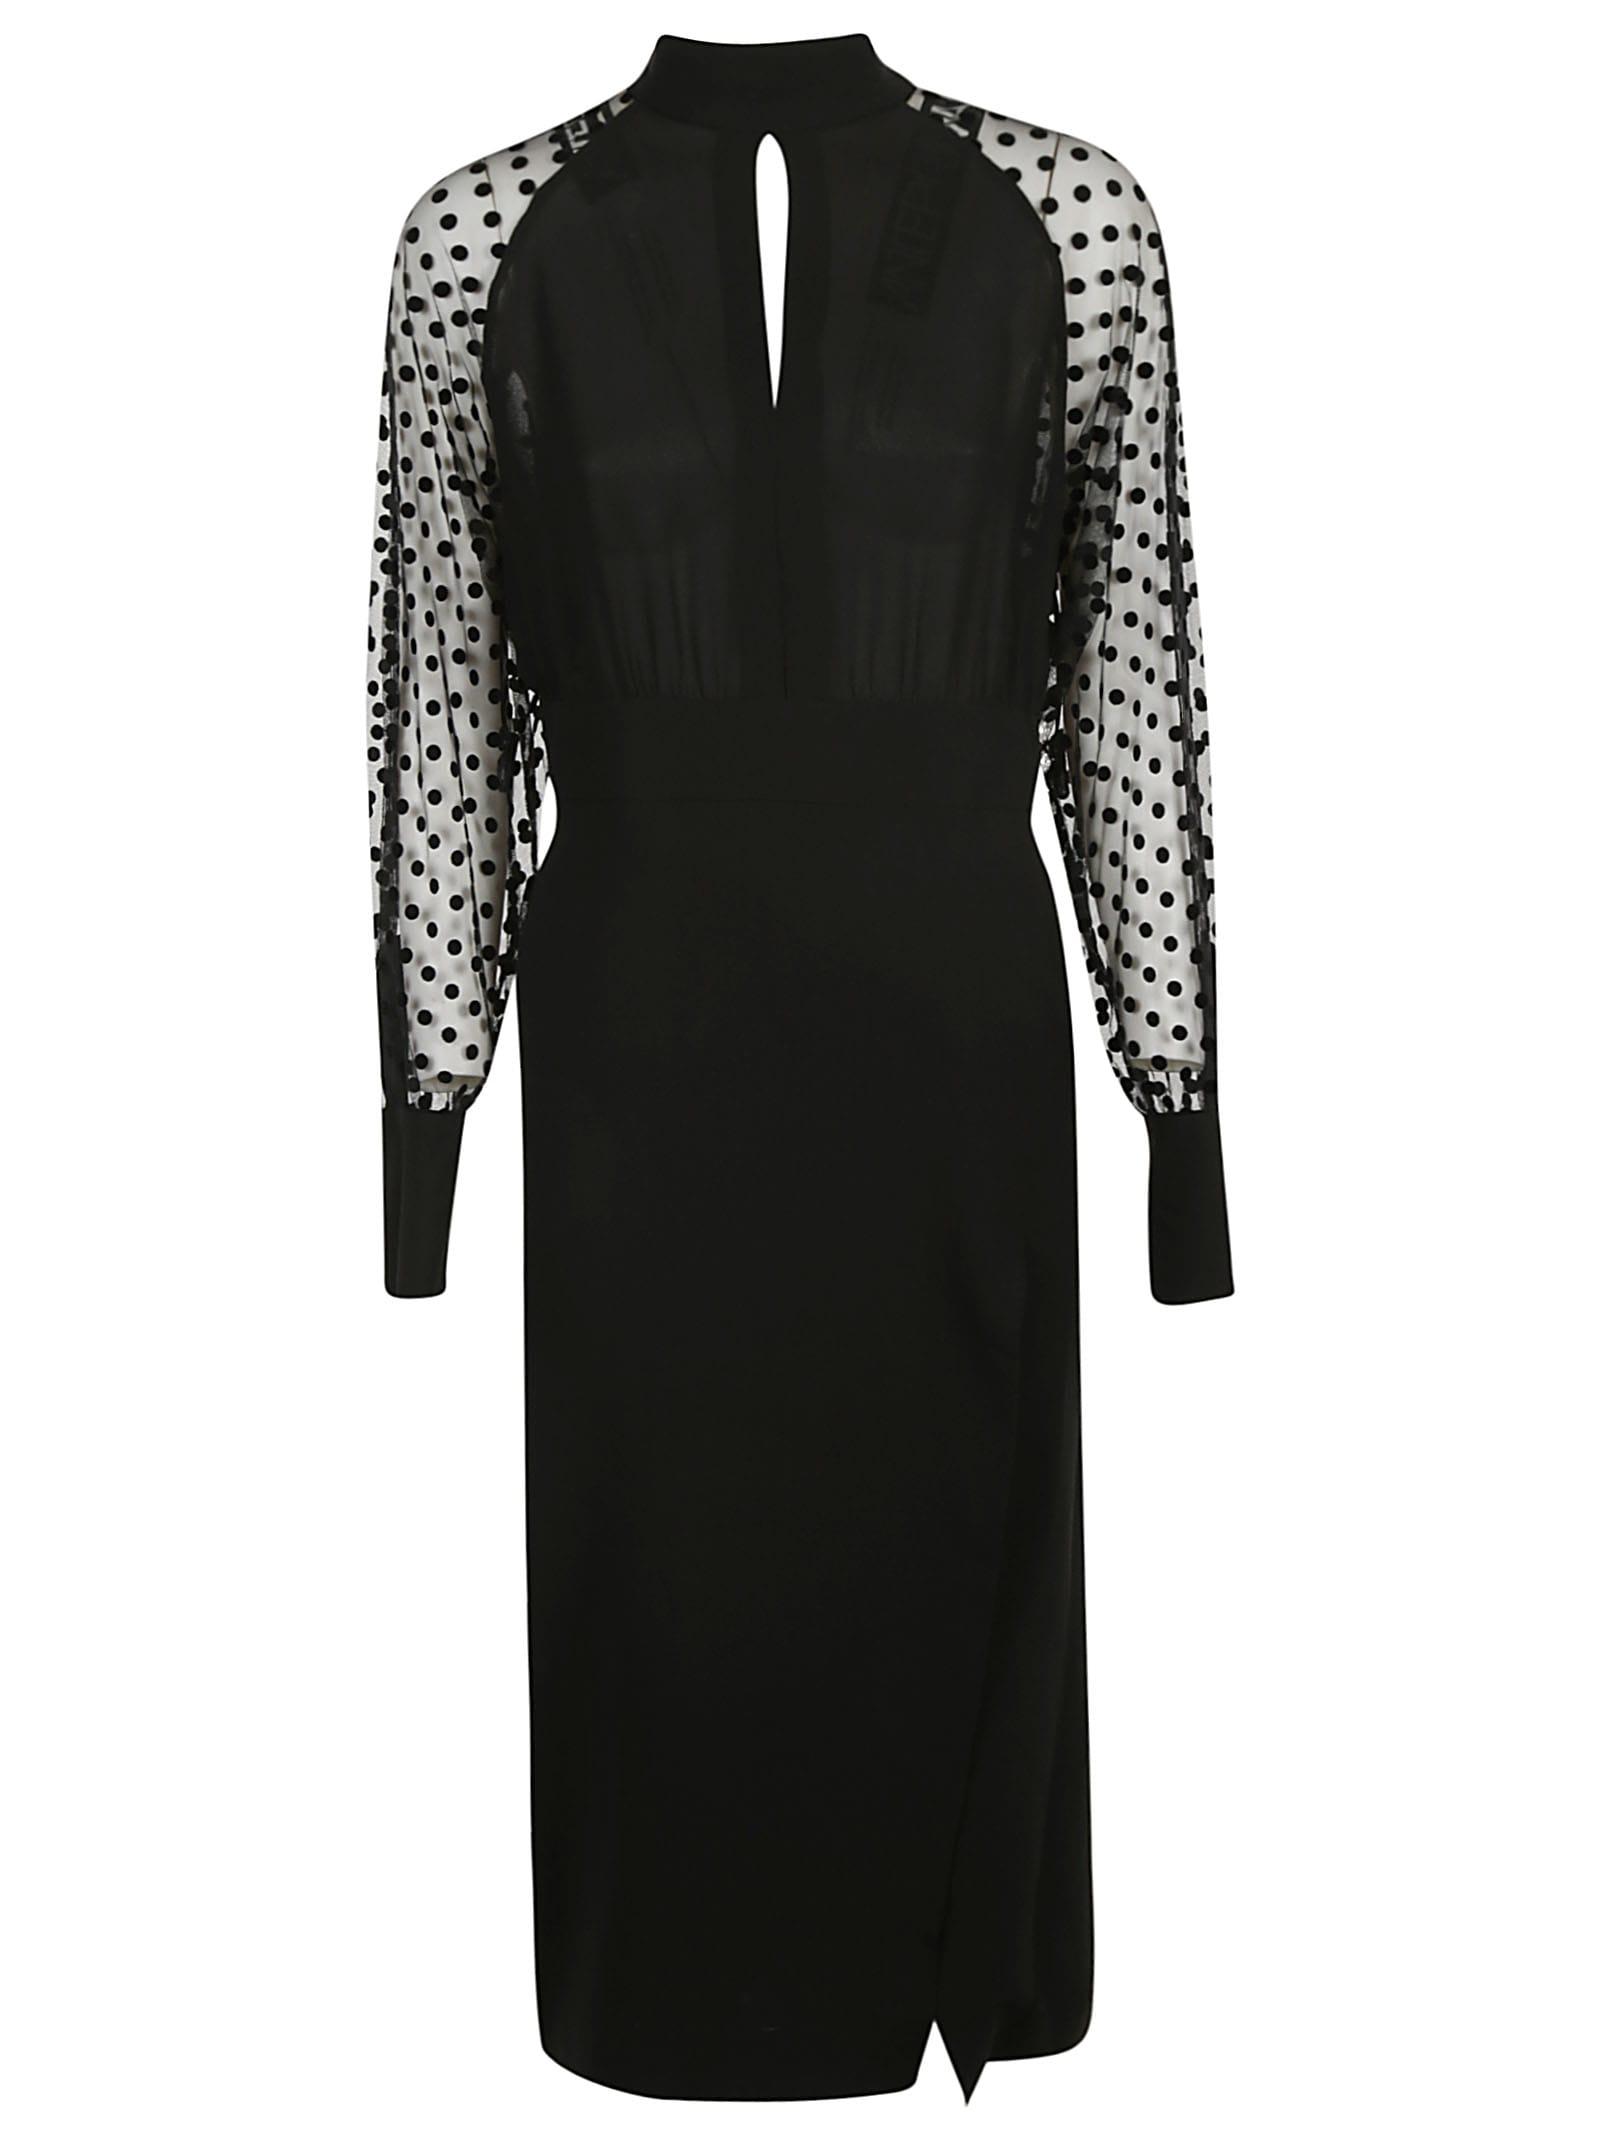 Balmain See-through Sleeveless Long Length Dress